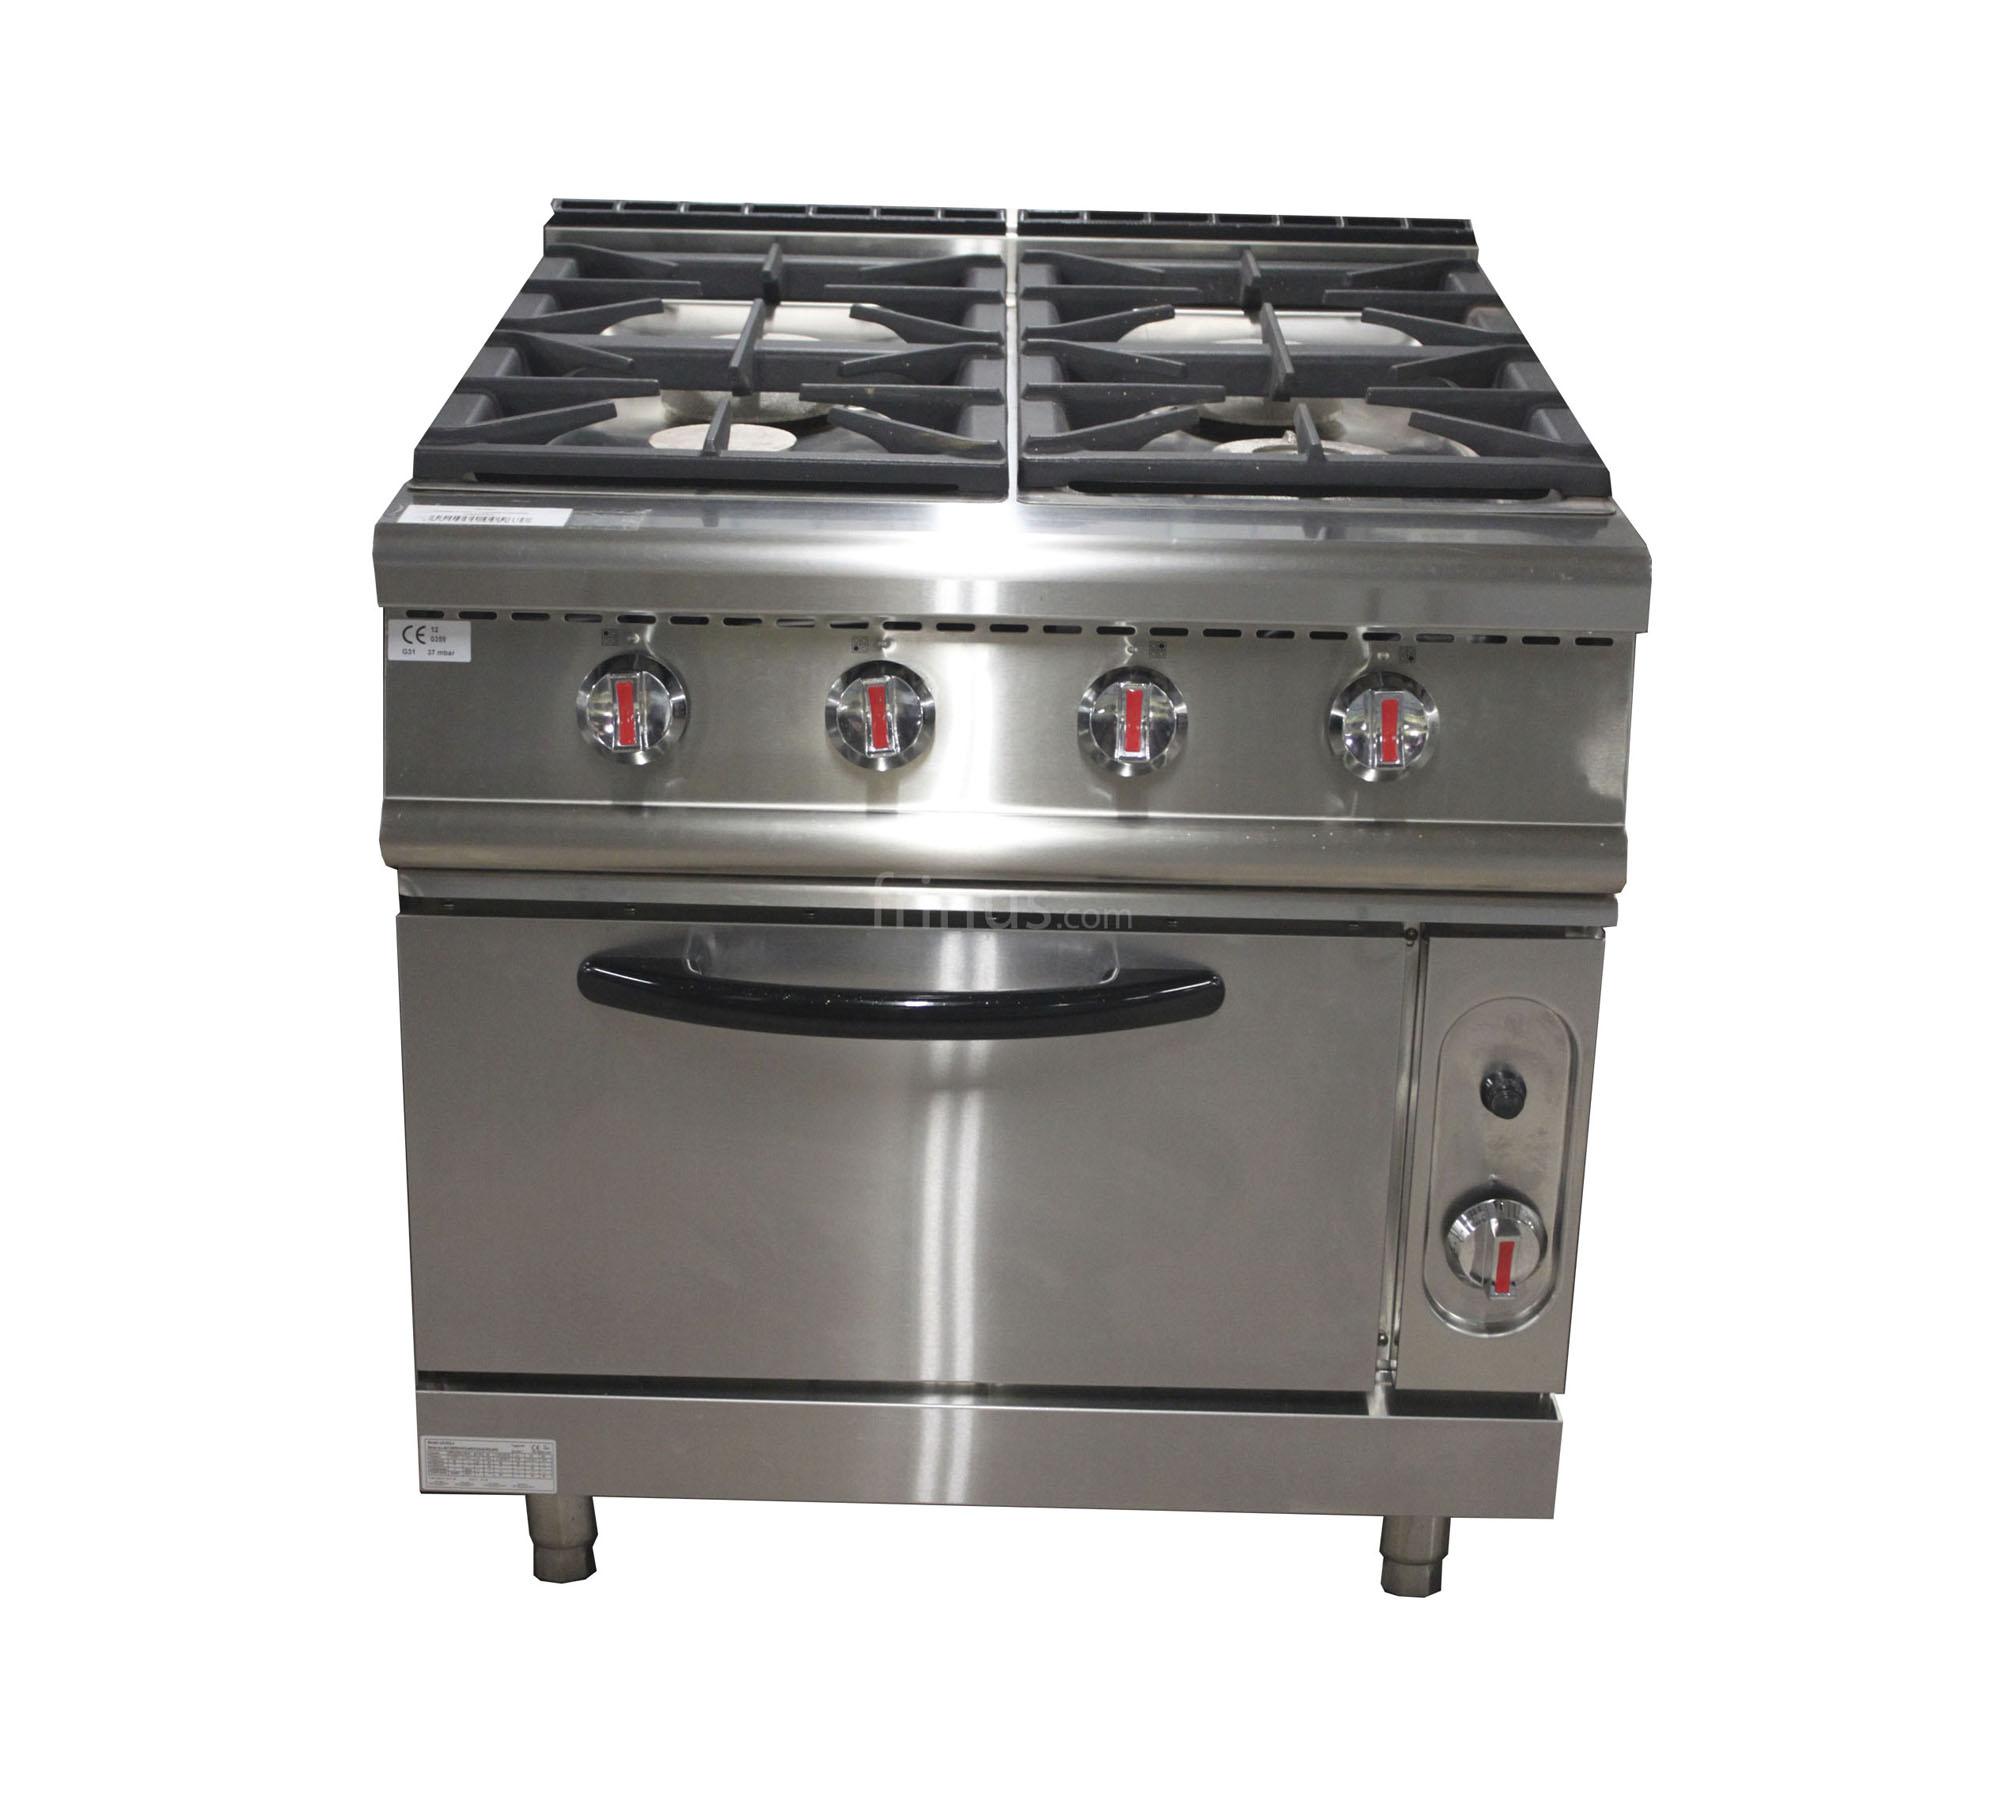 Bonito cocina a gas con horno im genes cocina a gas 3 for Cocinas 5 fuegos gas